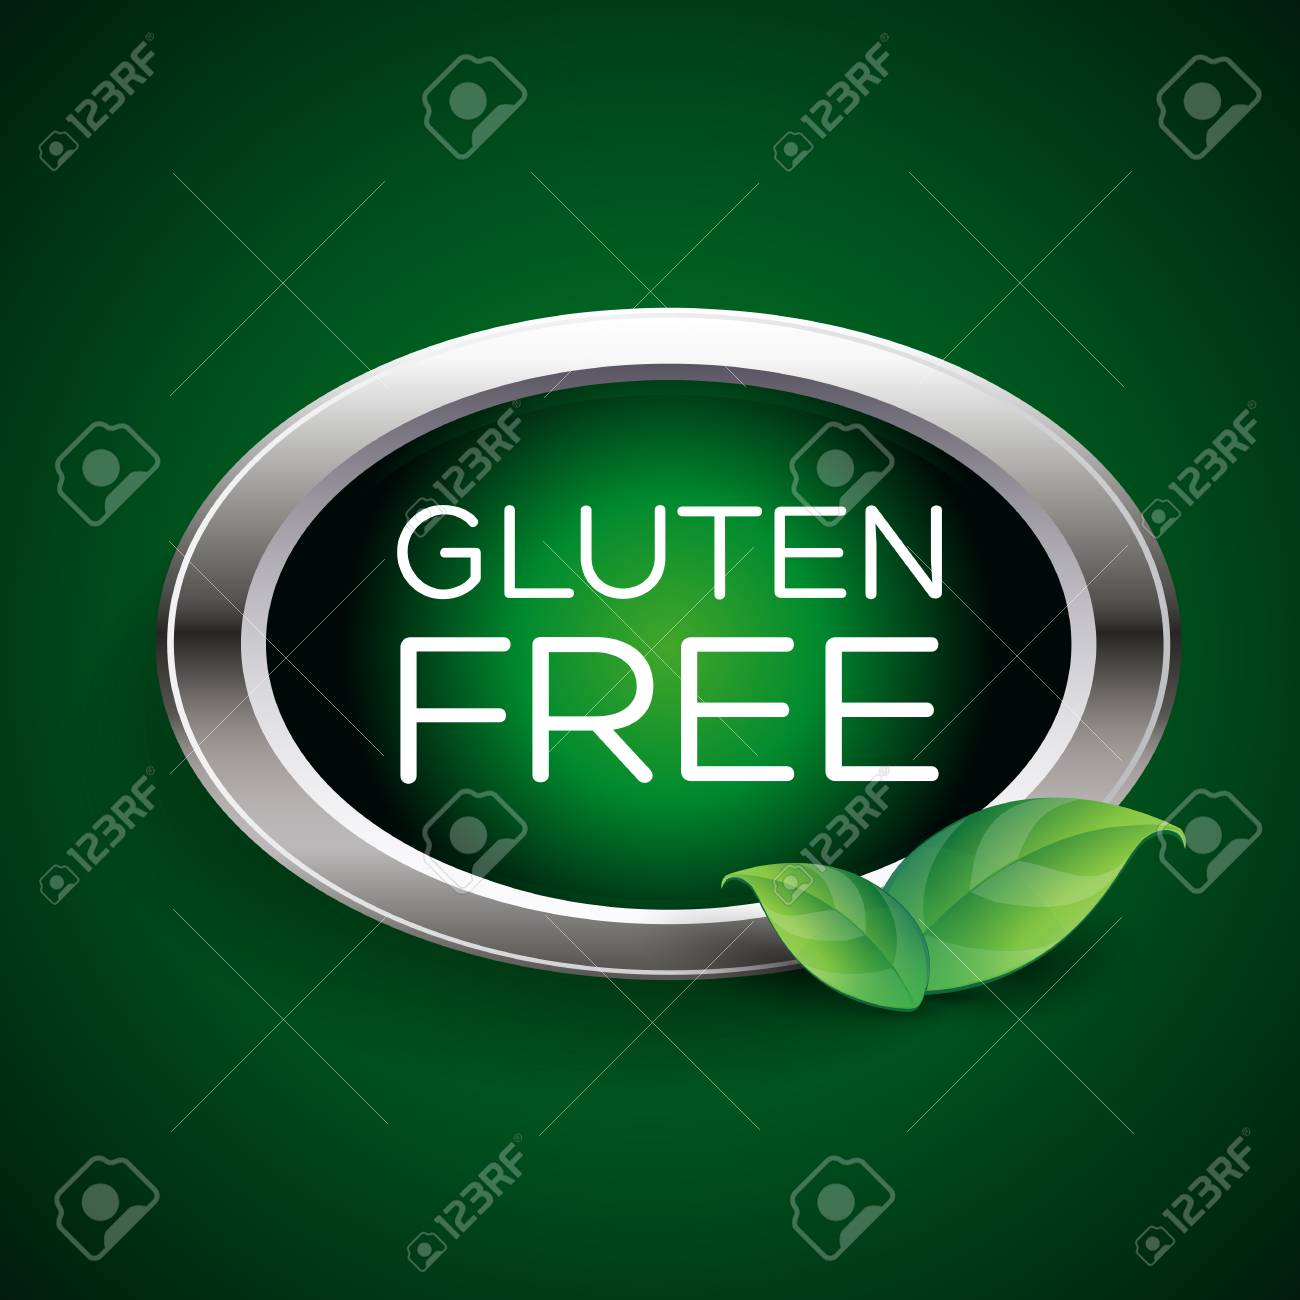 Gluten free label or badge - 37289550